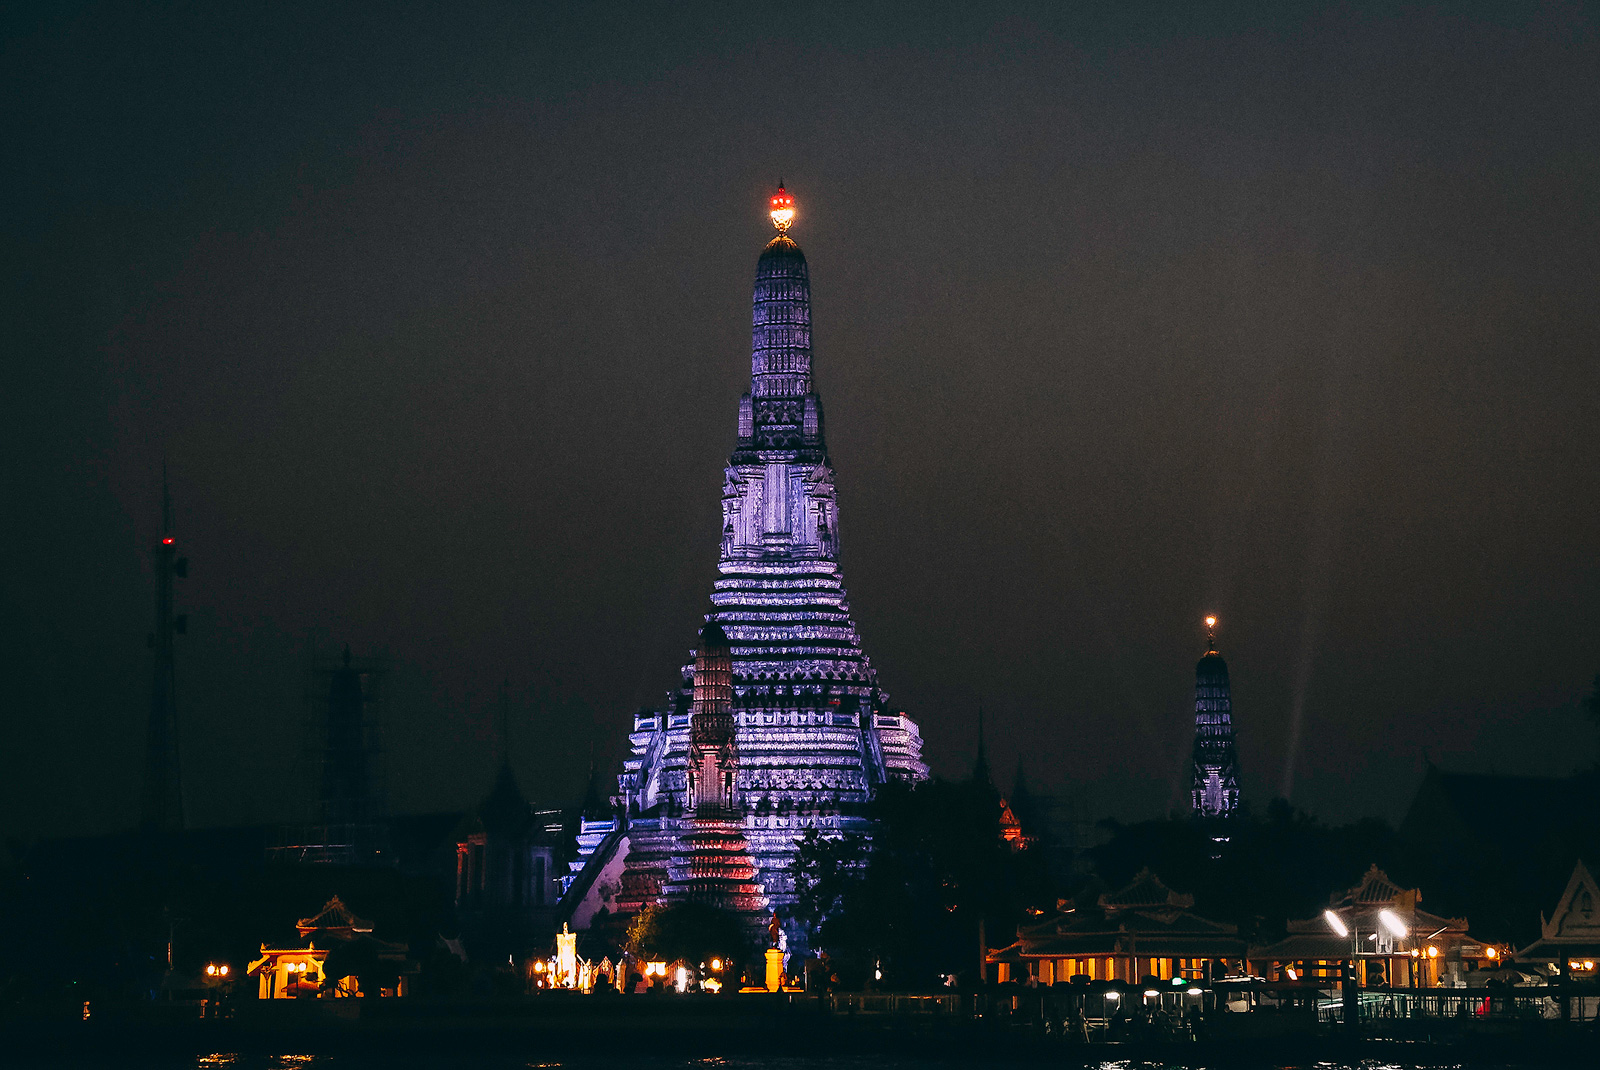 Fotospot Wat Arun, Bangkok, Thailand, kathrinsworld, Kathrin's World